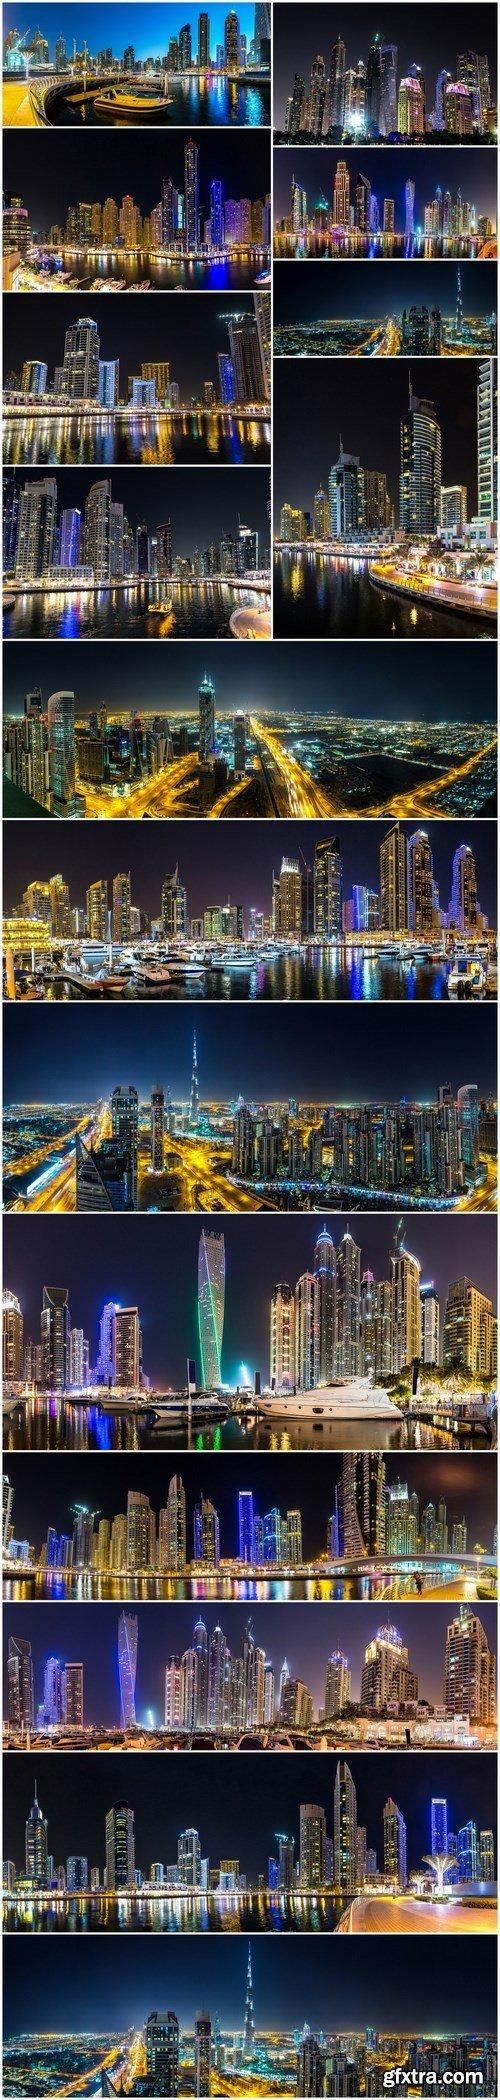 Dubai Travel 5 - 16xUHQ JPEG